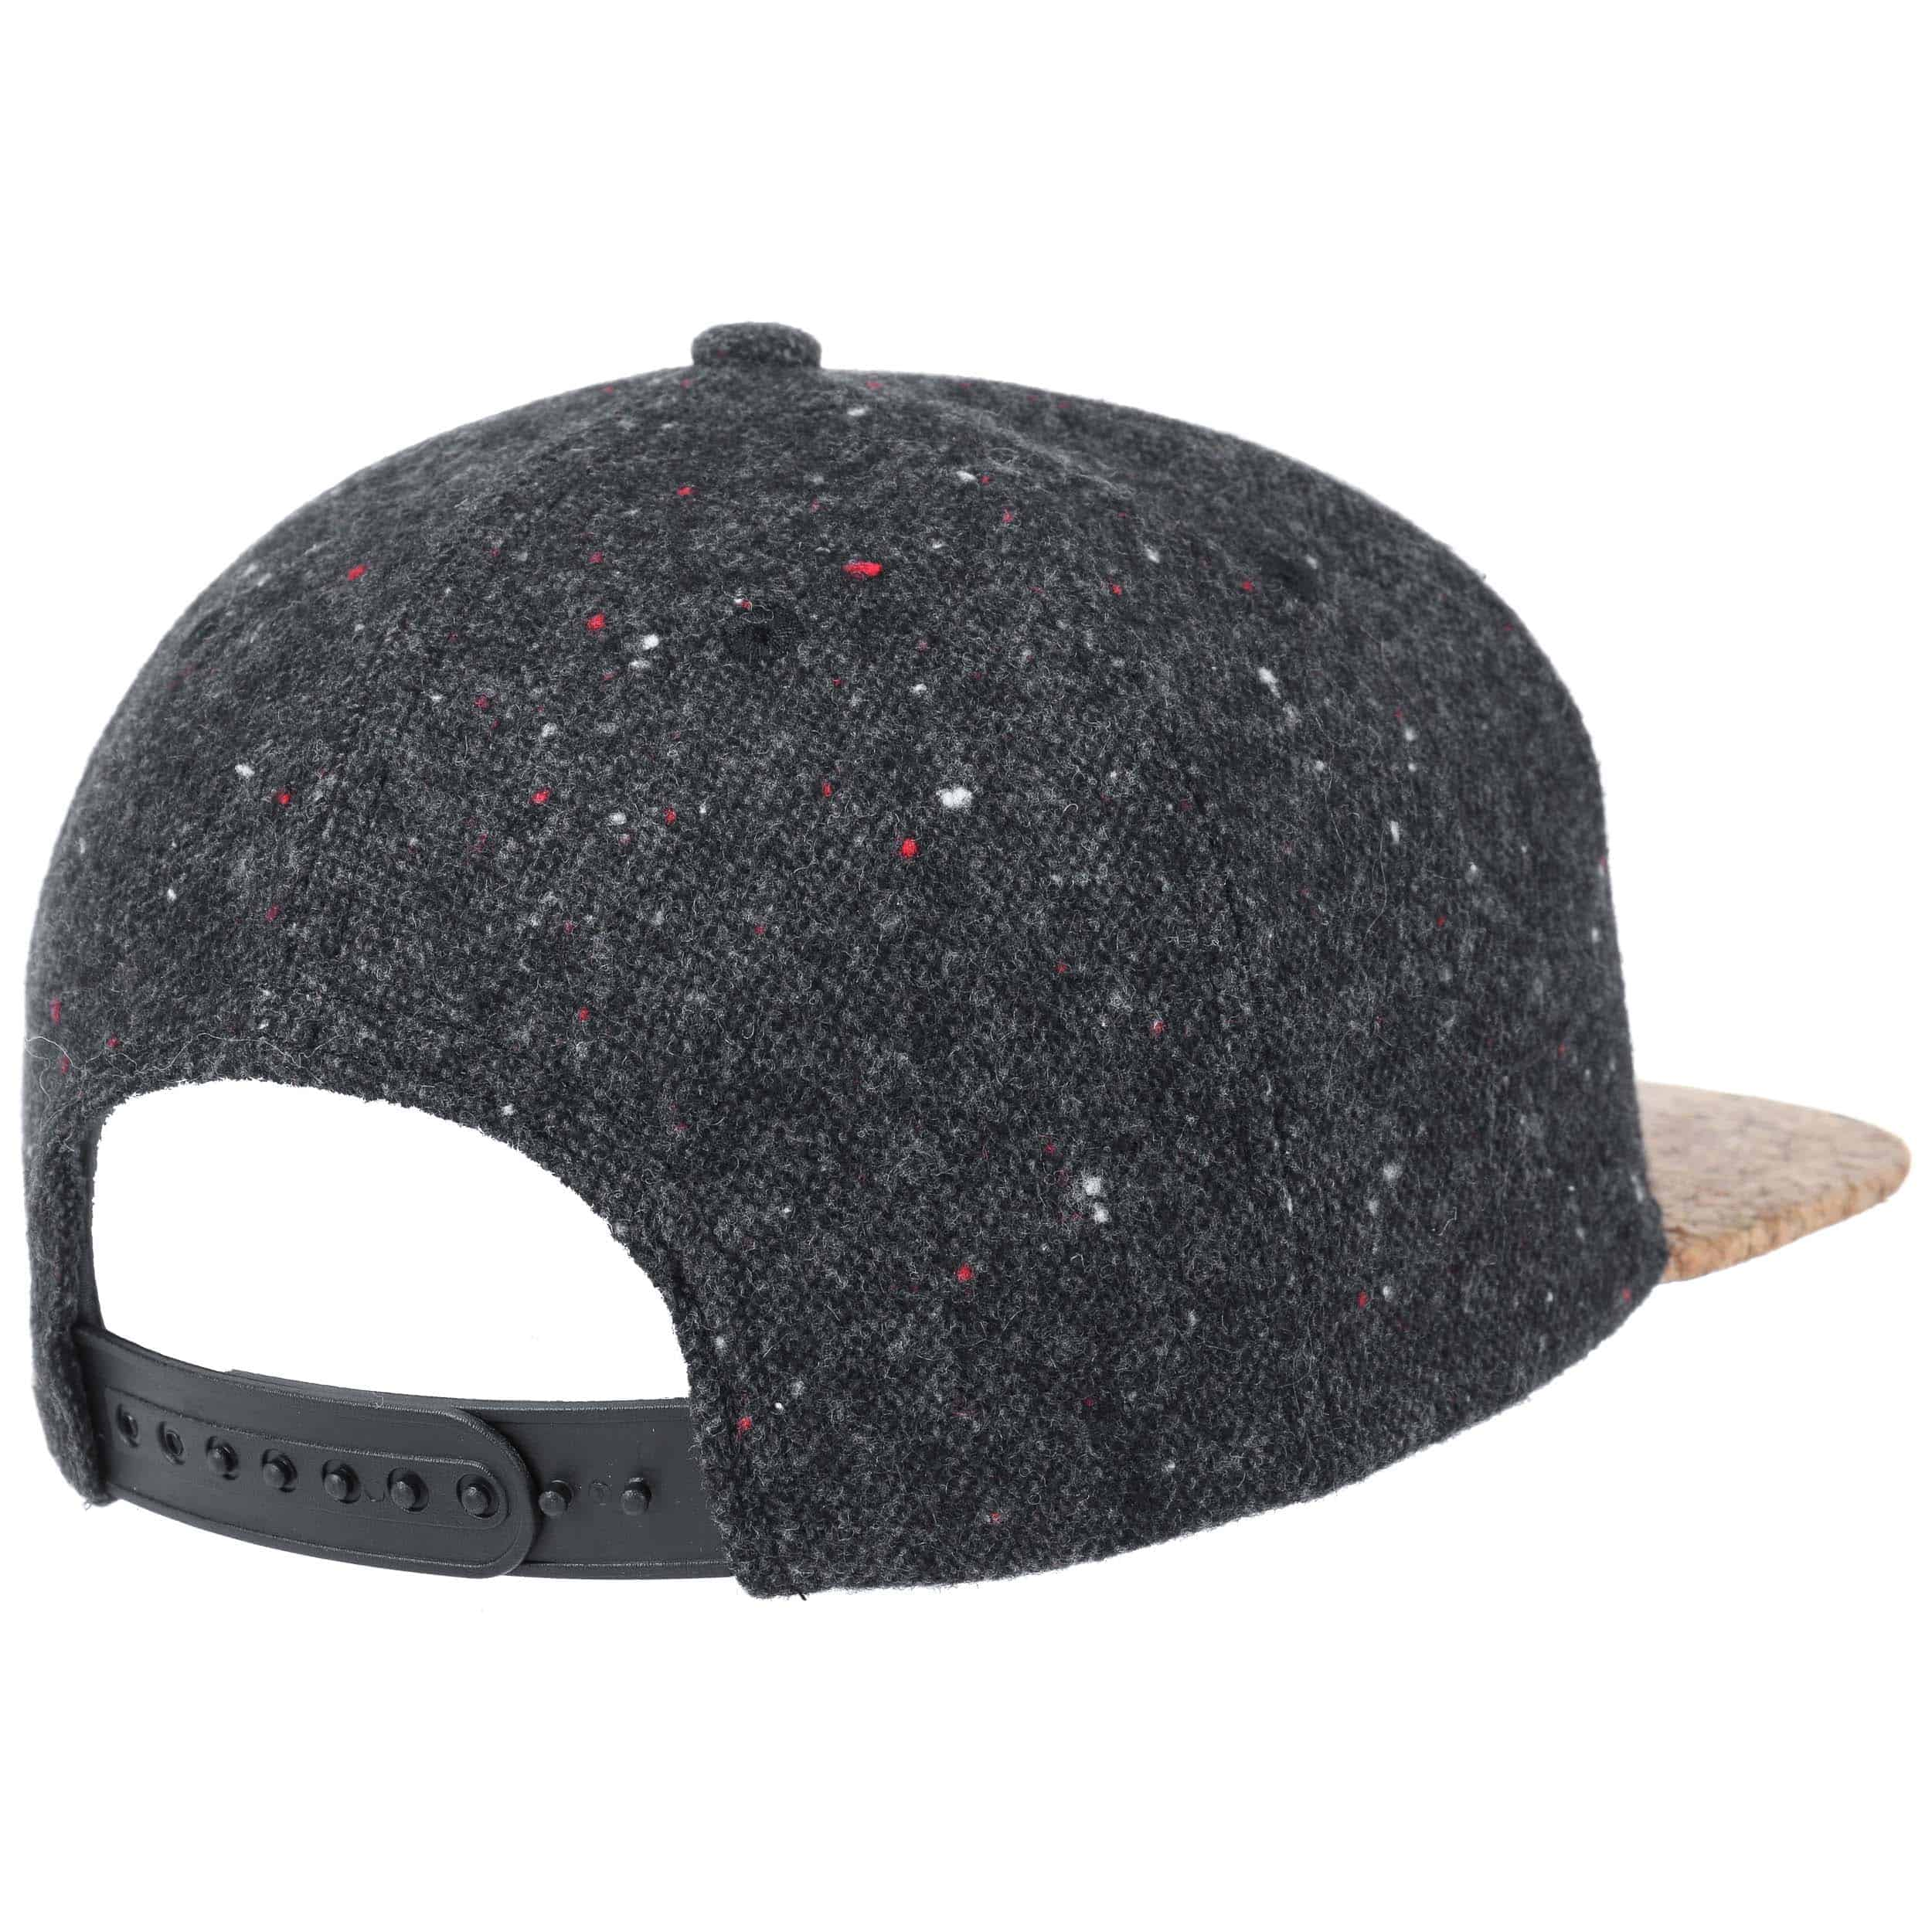 Pulag Cap Hat Barts yNUusxThgL